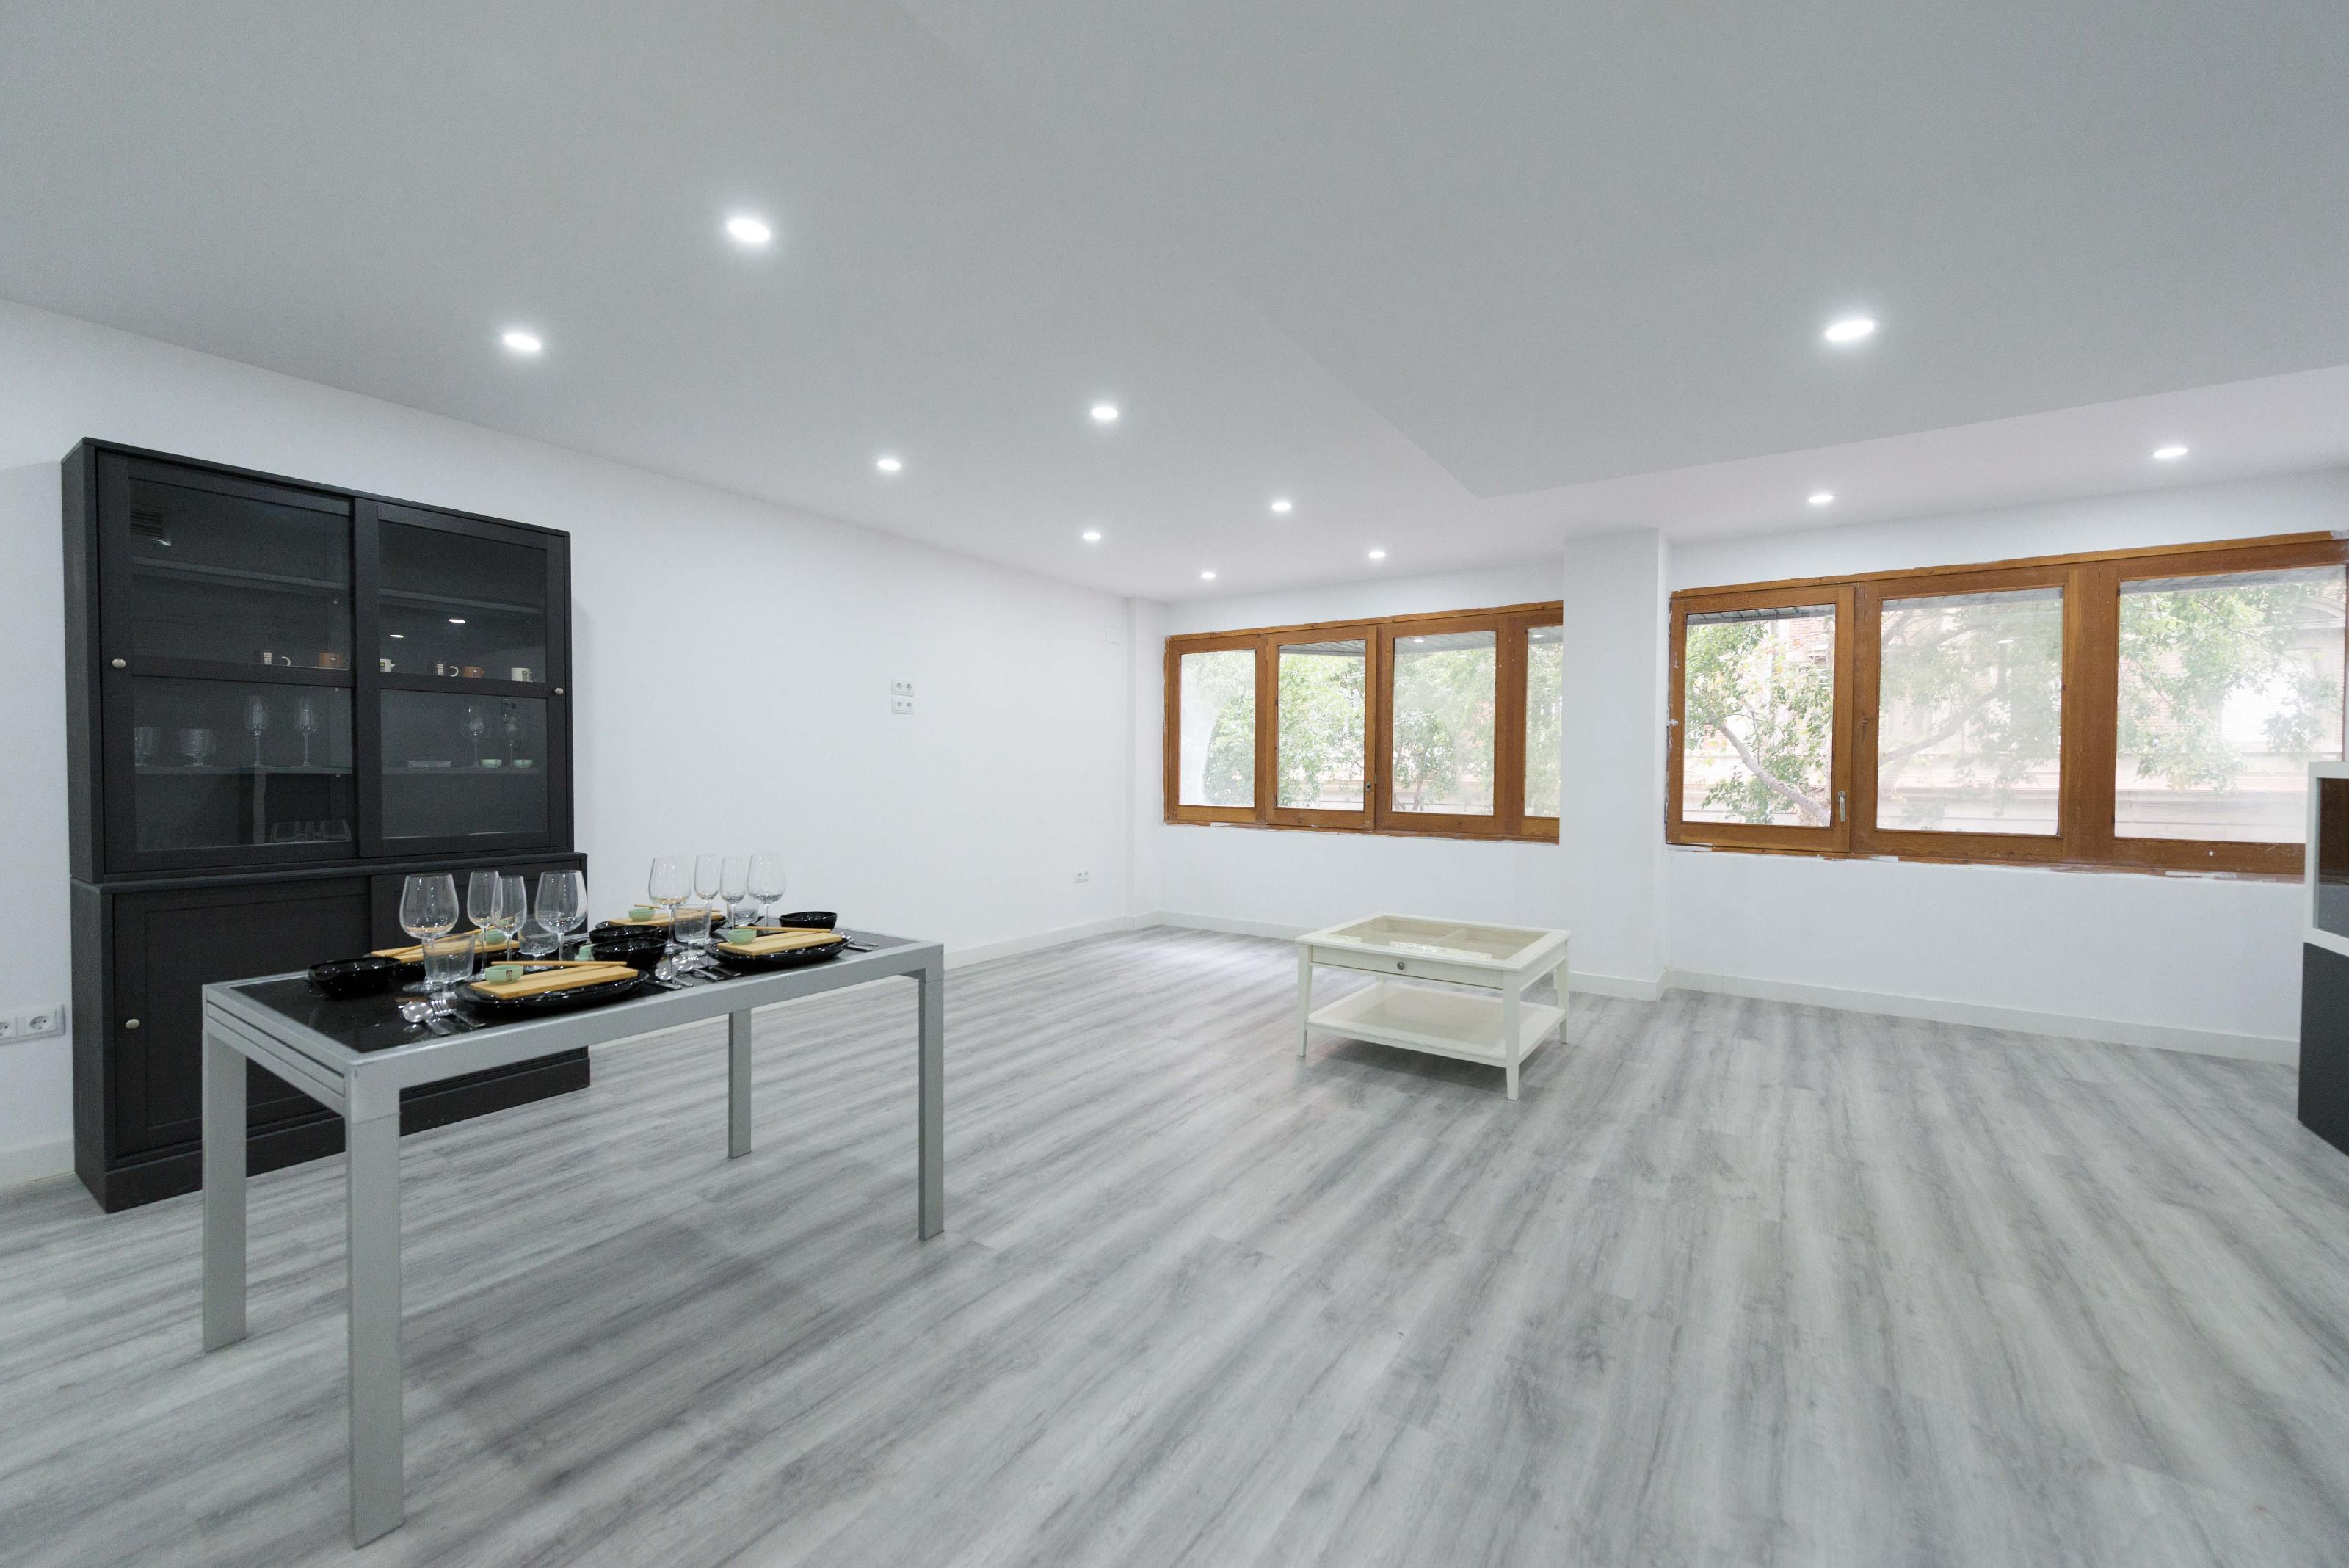 242980 Flat for sale in Eixample, Sagrada Familia 9